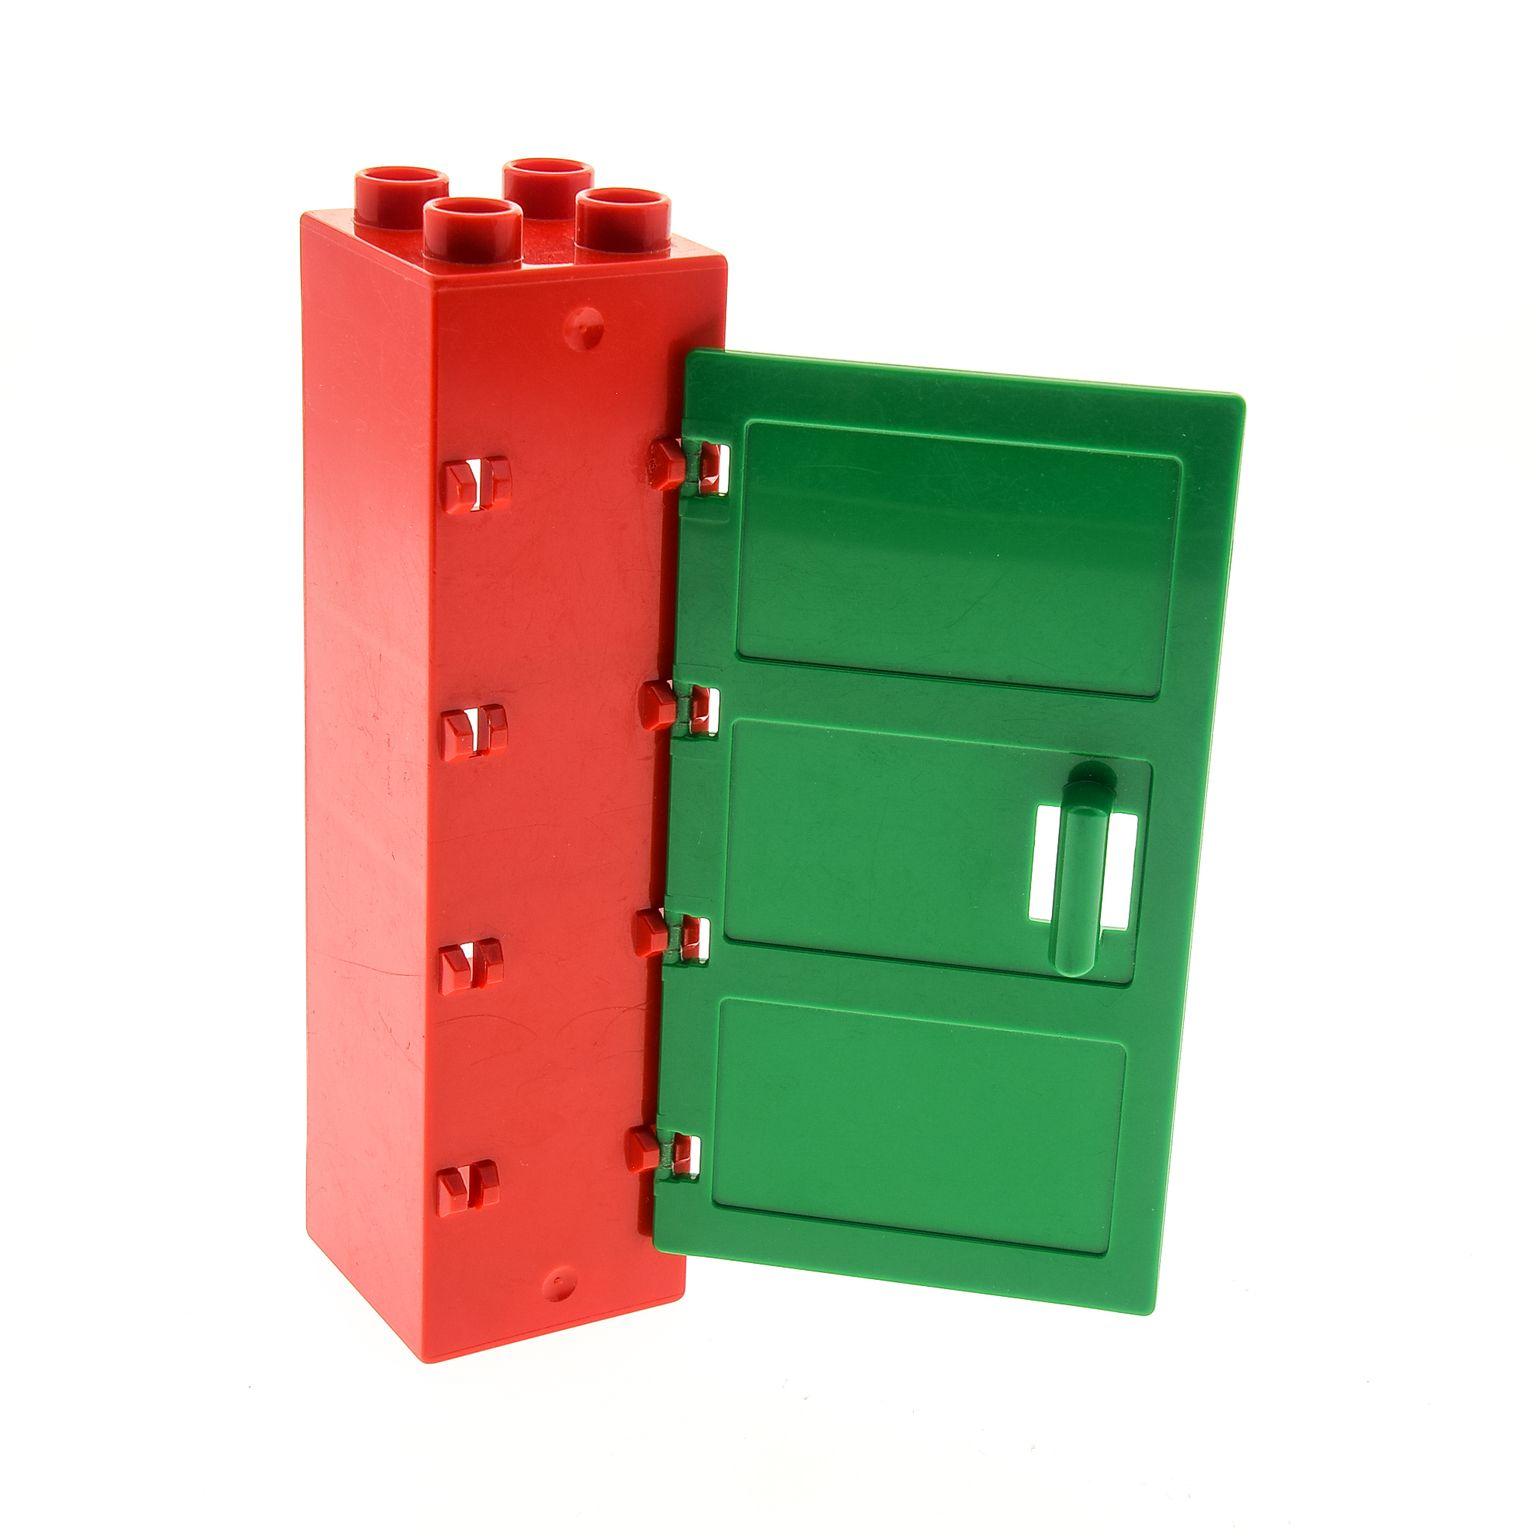 1 x Lego Duplo Möbel Regal rot 2x2x6 Schrank Tür Säule Tor Rahmen ...